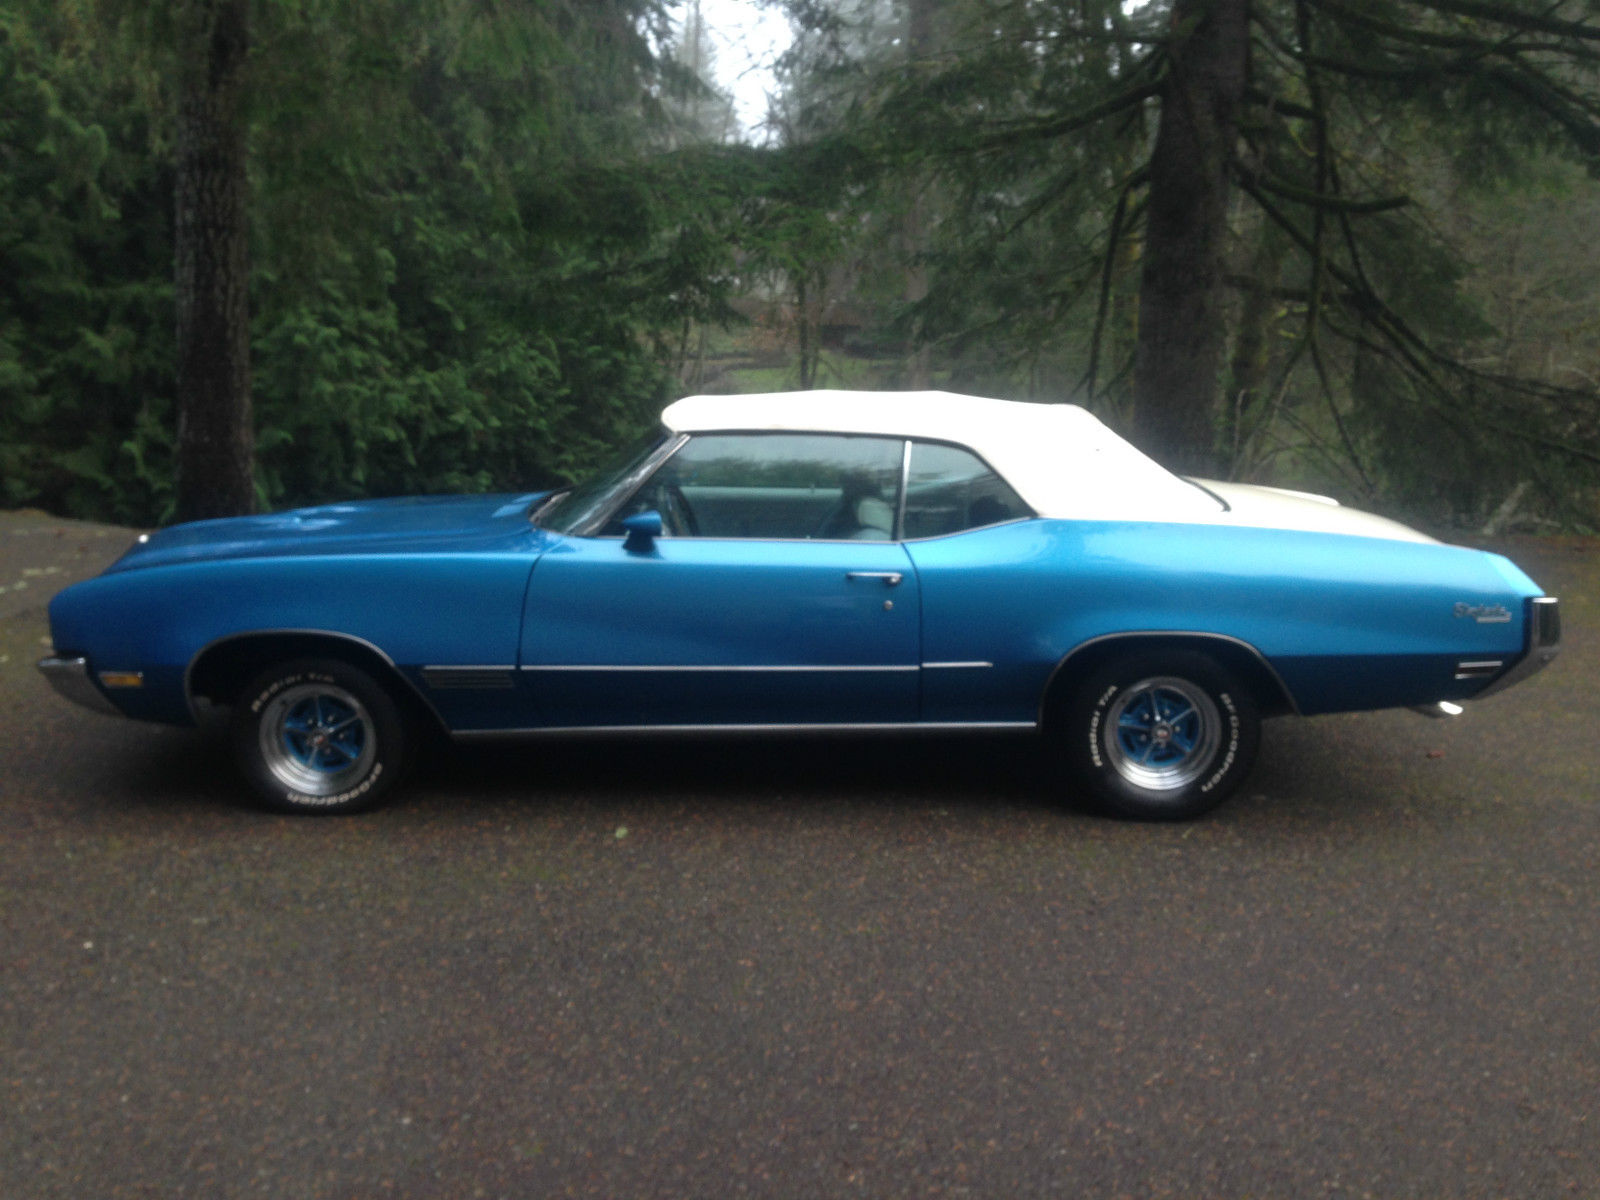 1971 buick skylark custom convertible *great condition*